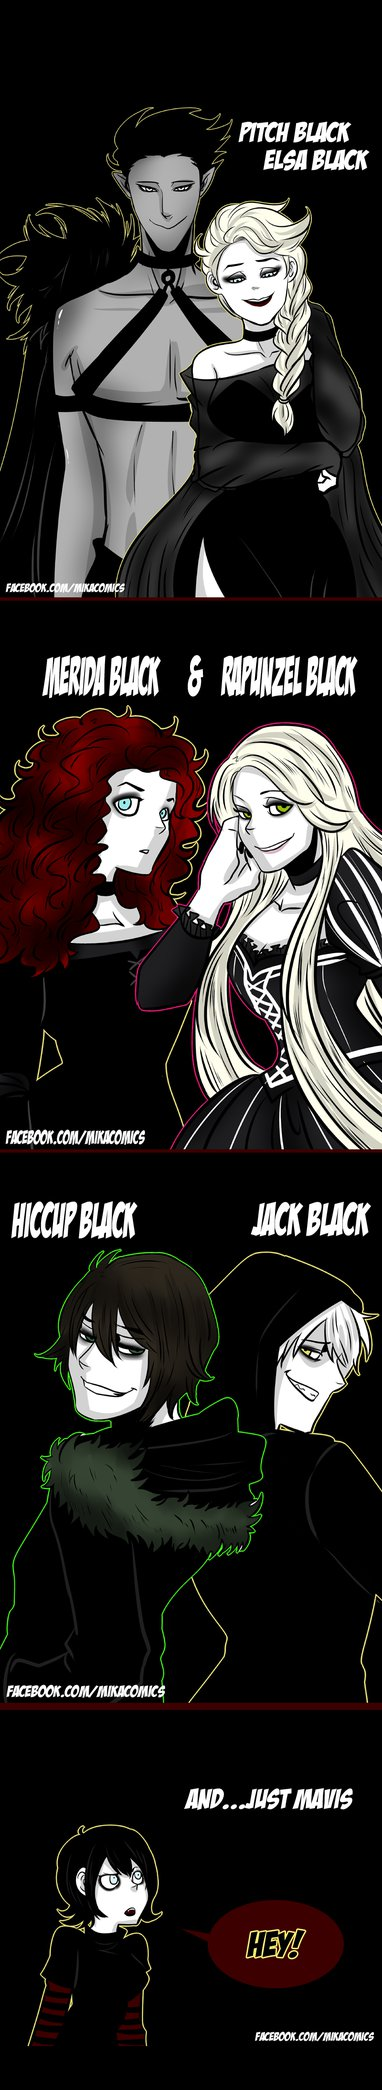 Pitch Black and The Big Six Black by mikaeriksenweiseth on deviantART ^